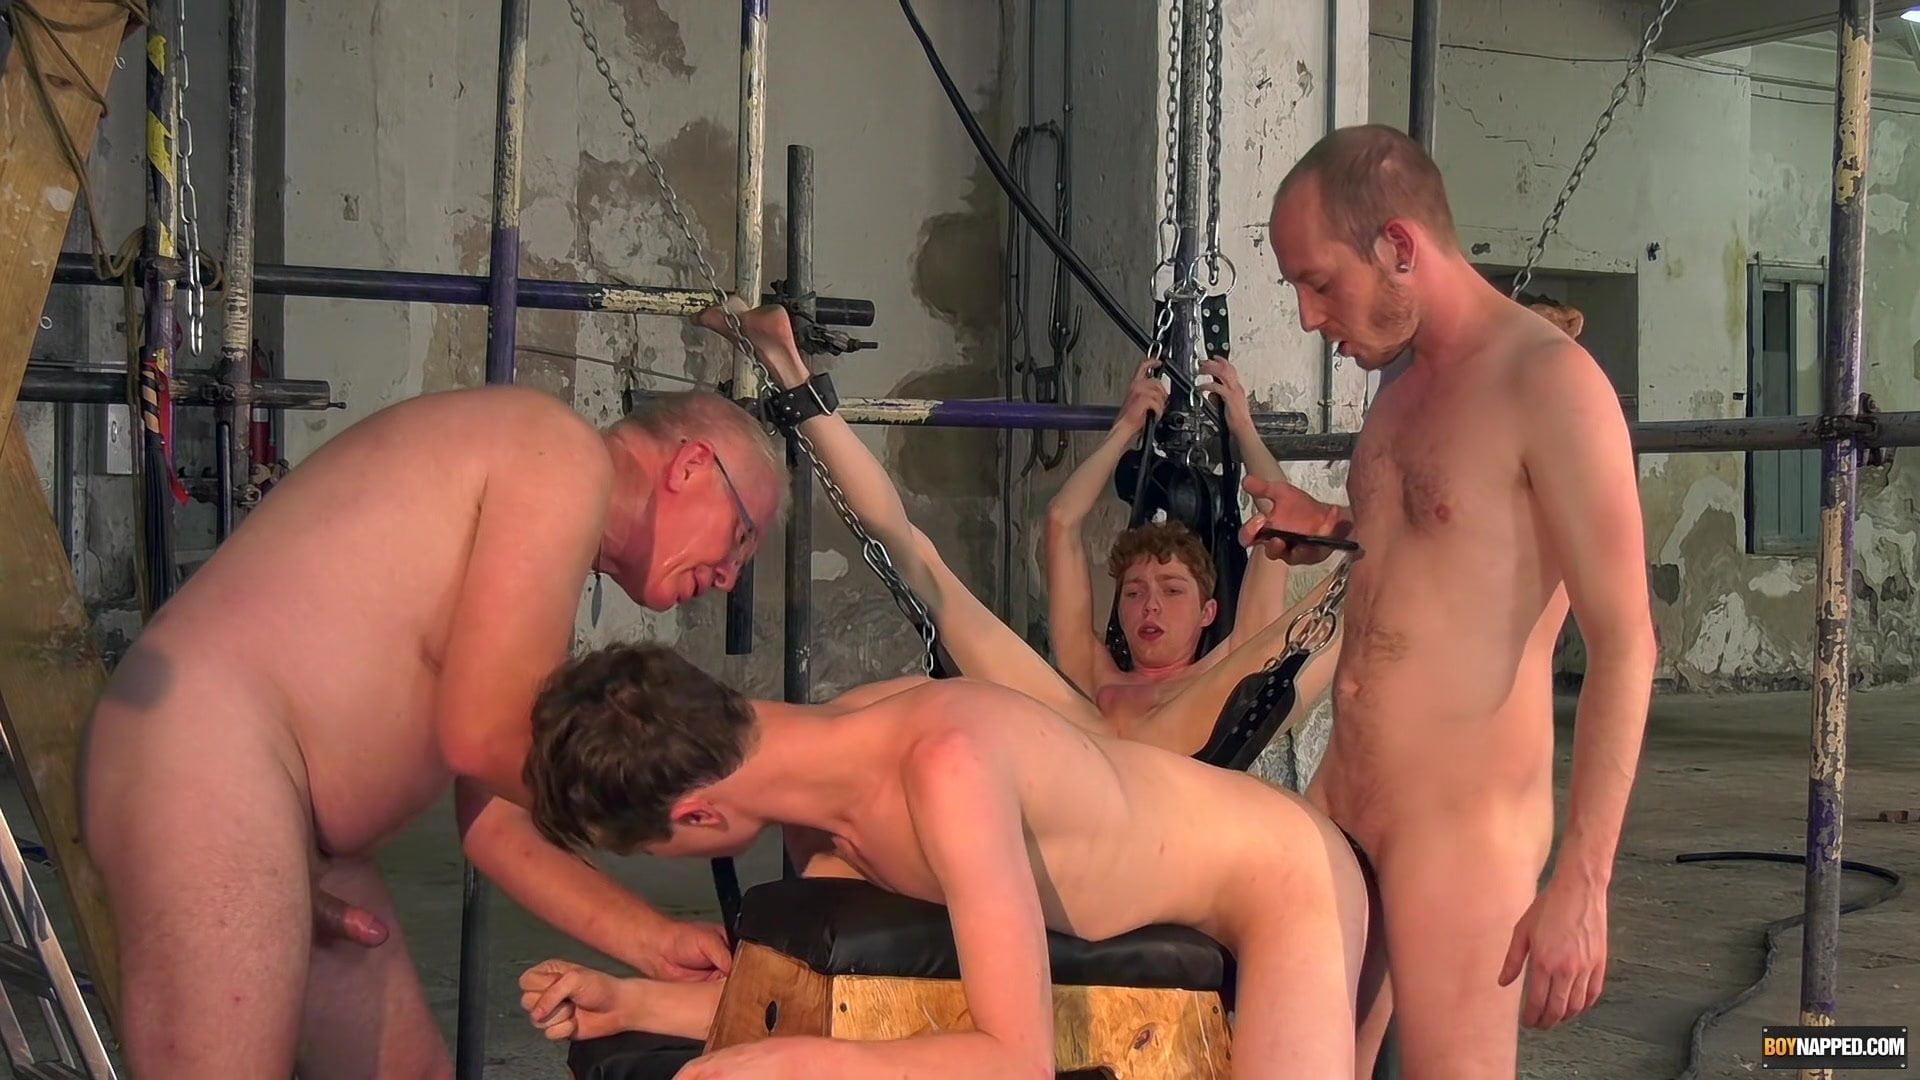 bondage uncut outdoor Bareback